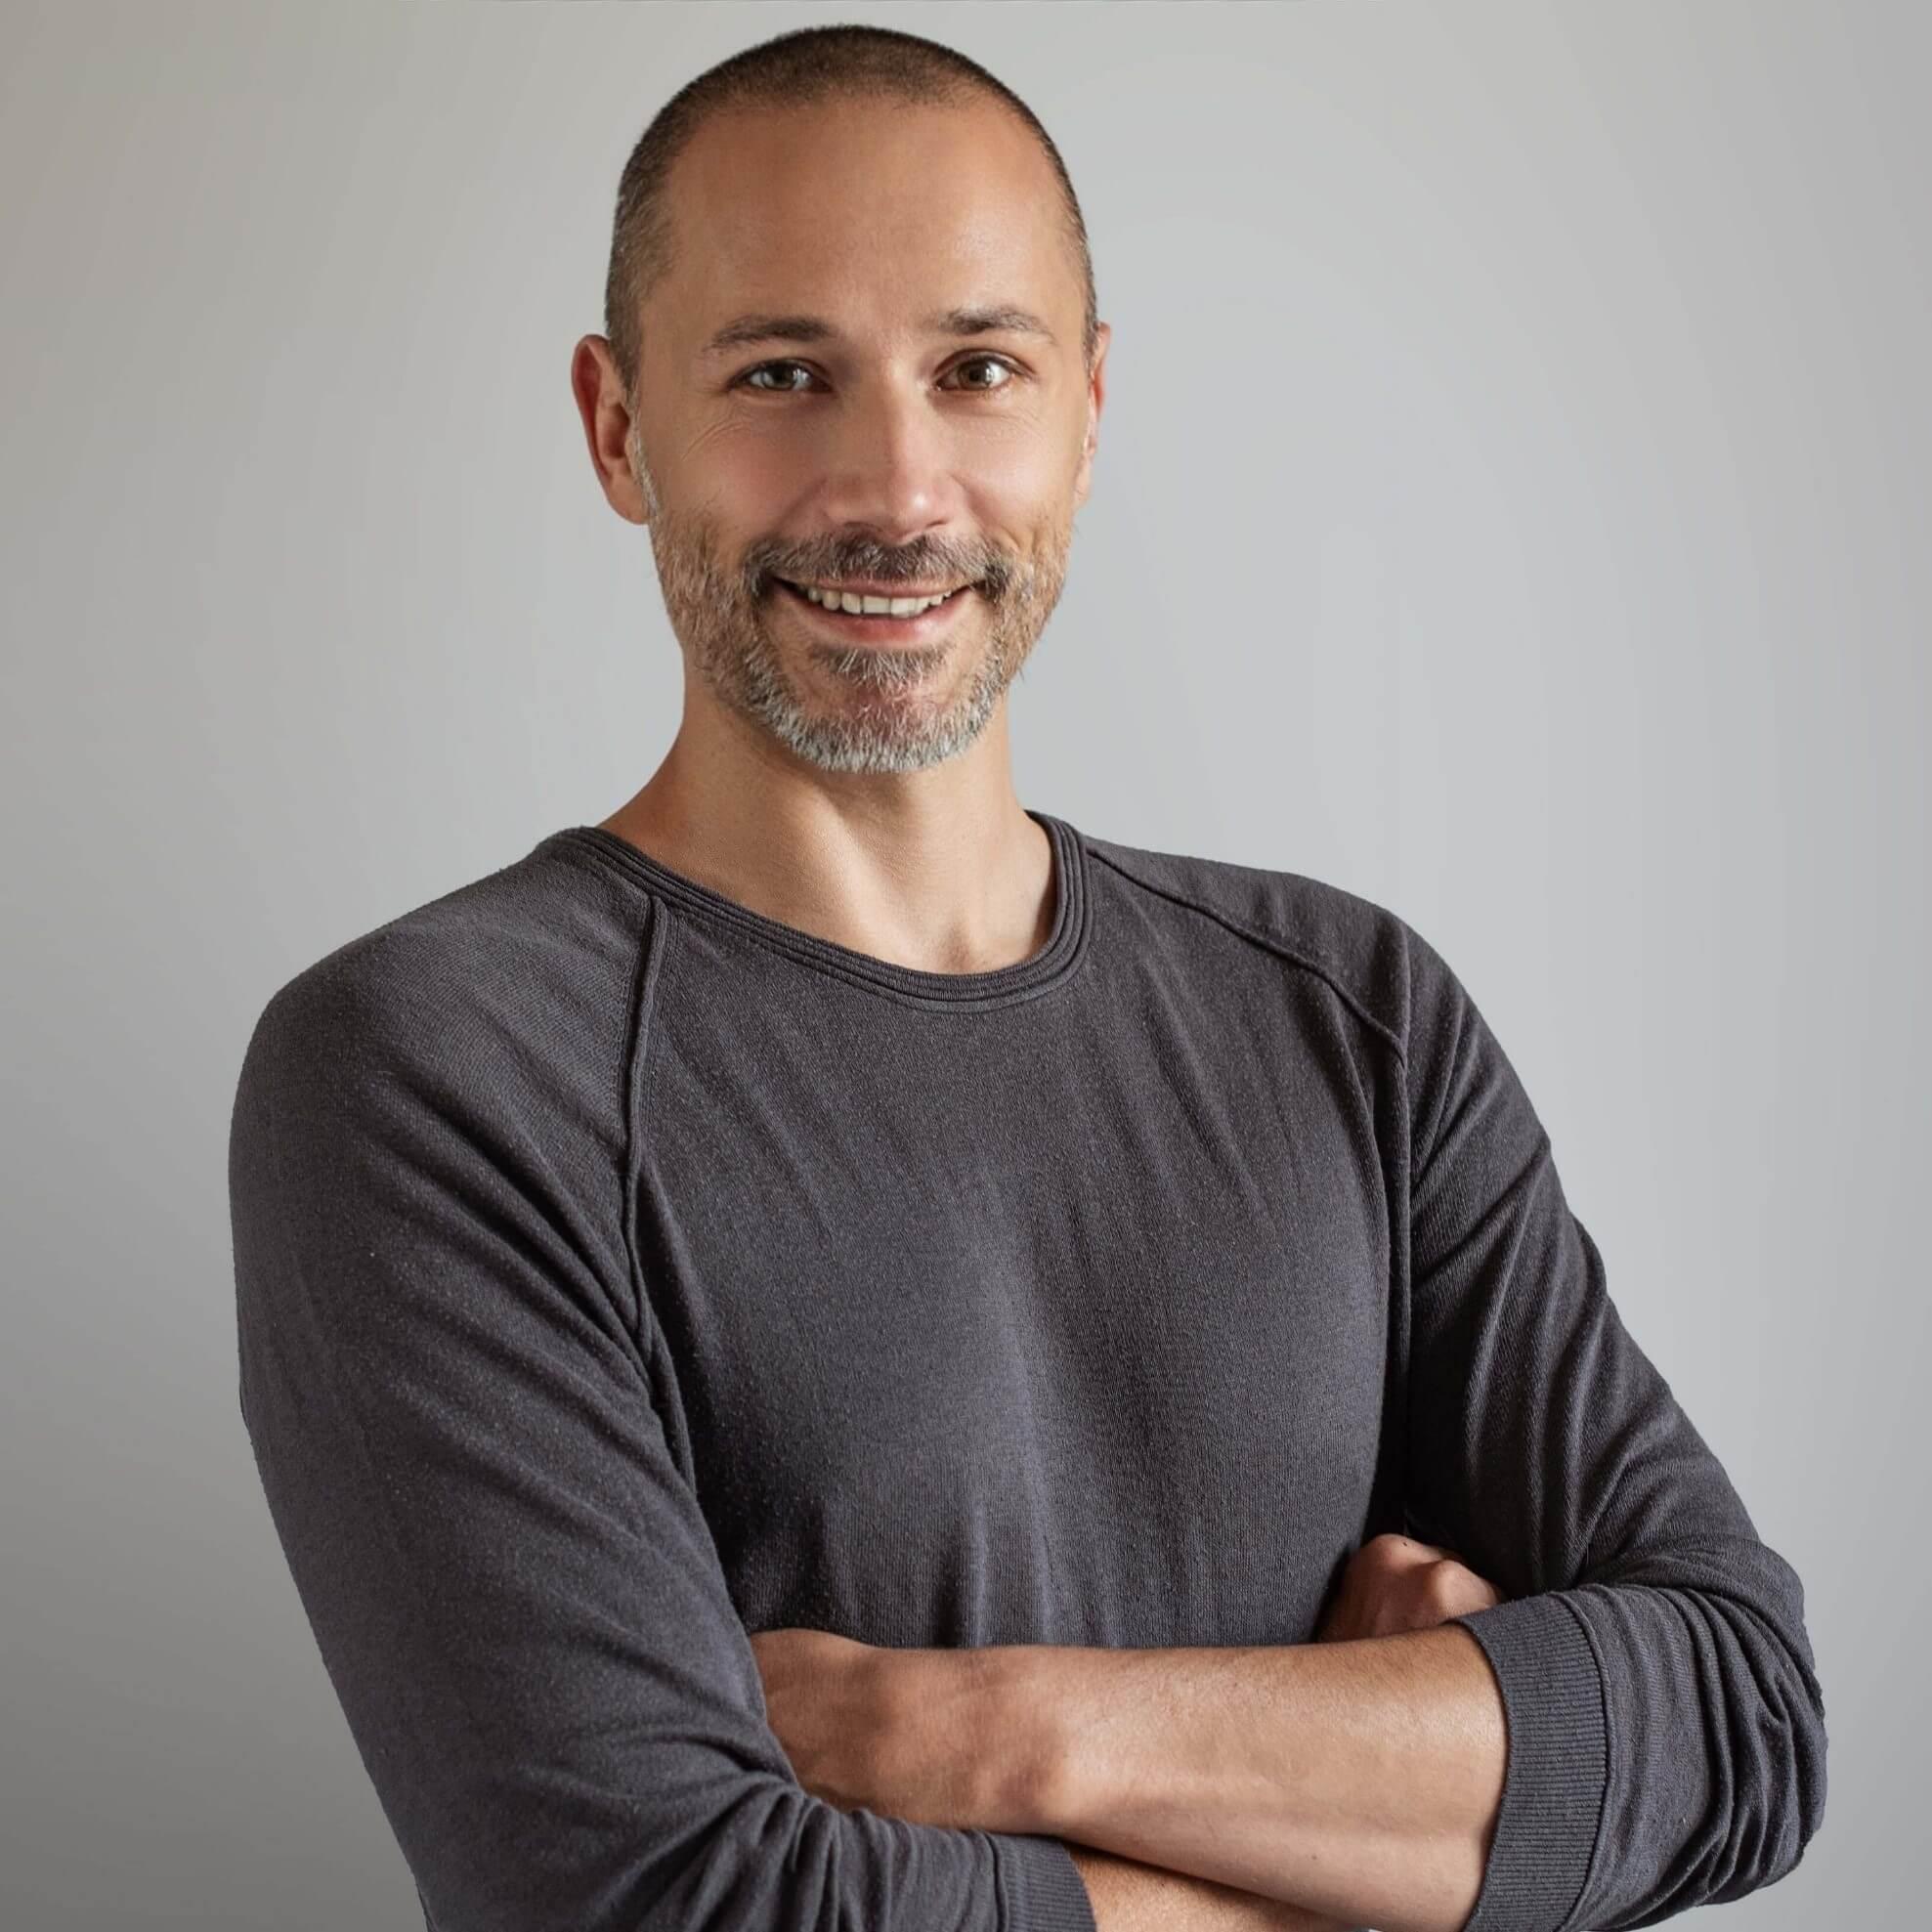 Philipp Eichholzer